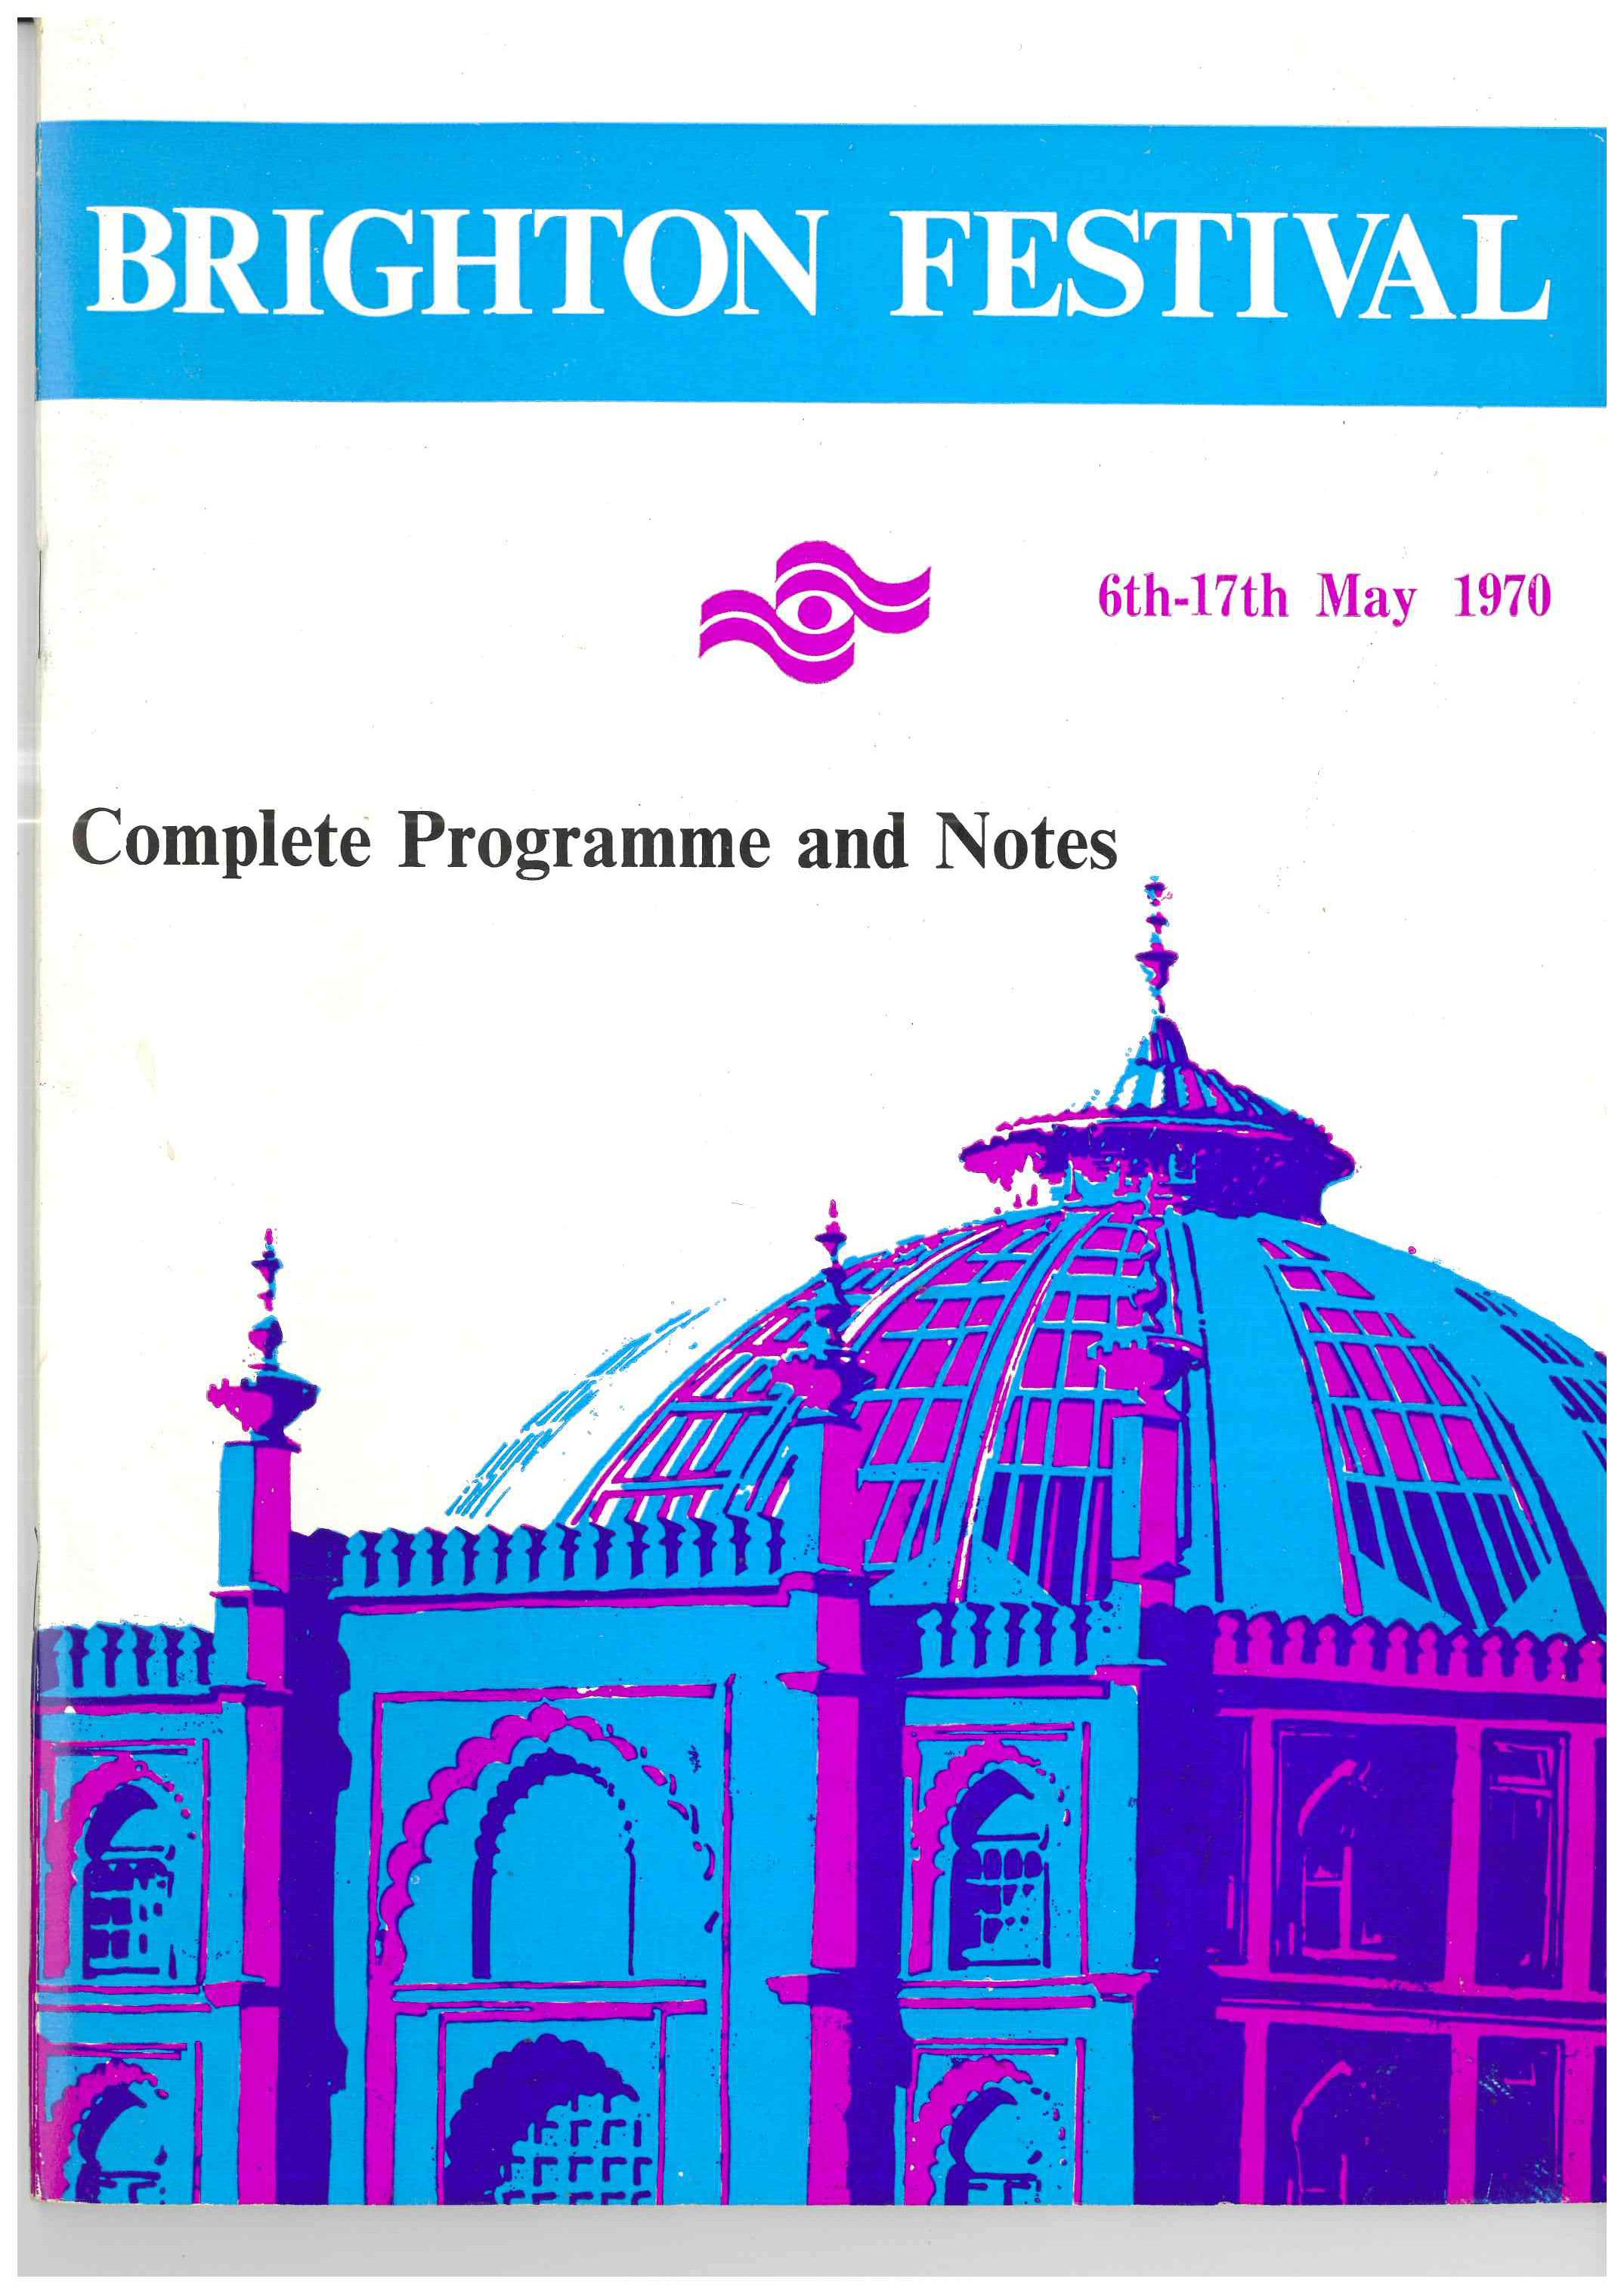 00094-BYO Brighton Festival 1970.jpg